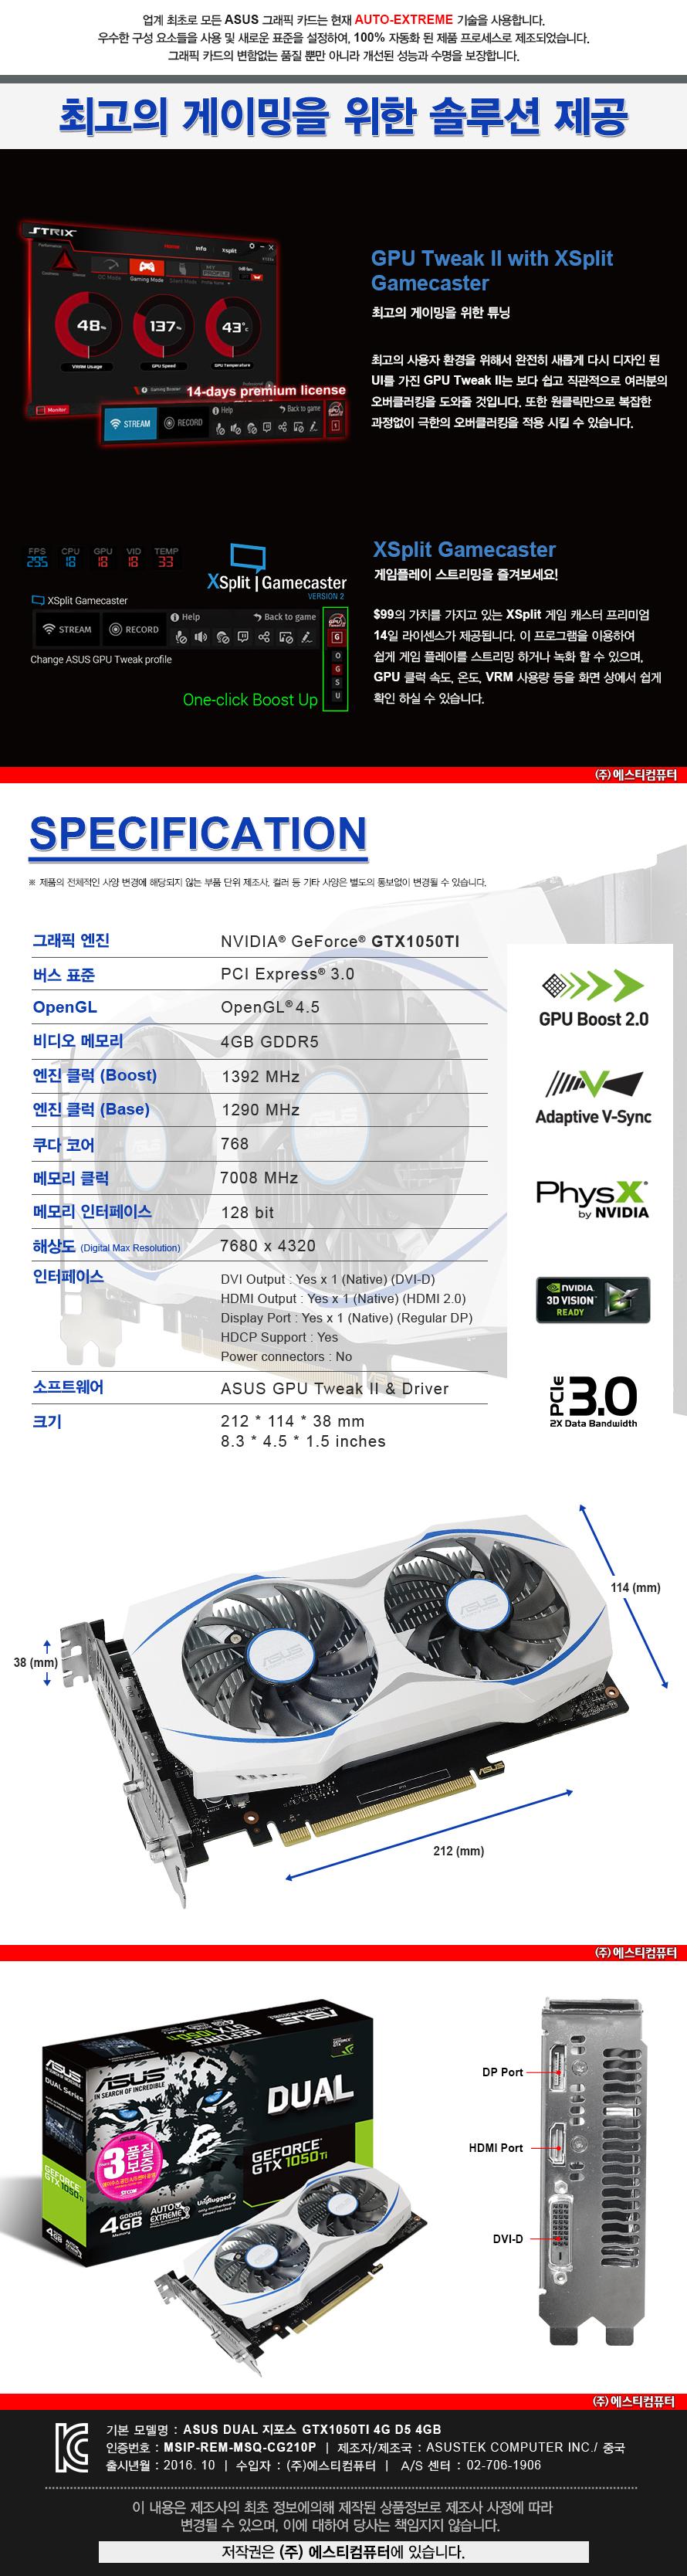 dual-gtx1050ti-4g_03